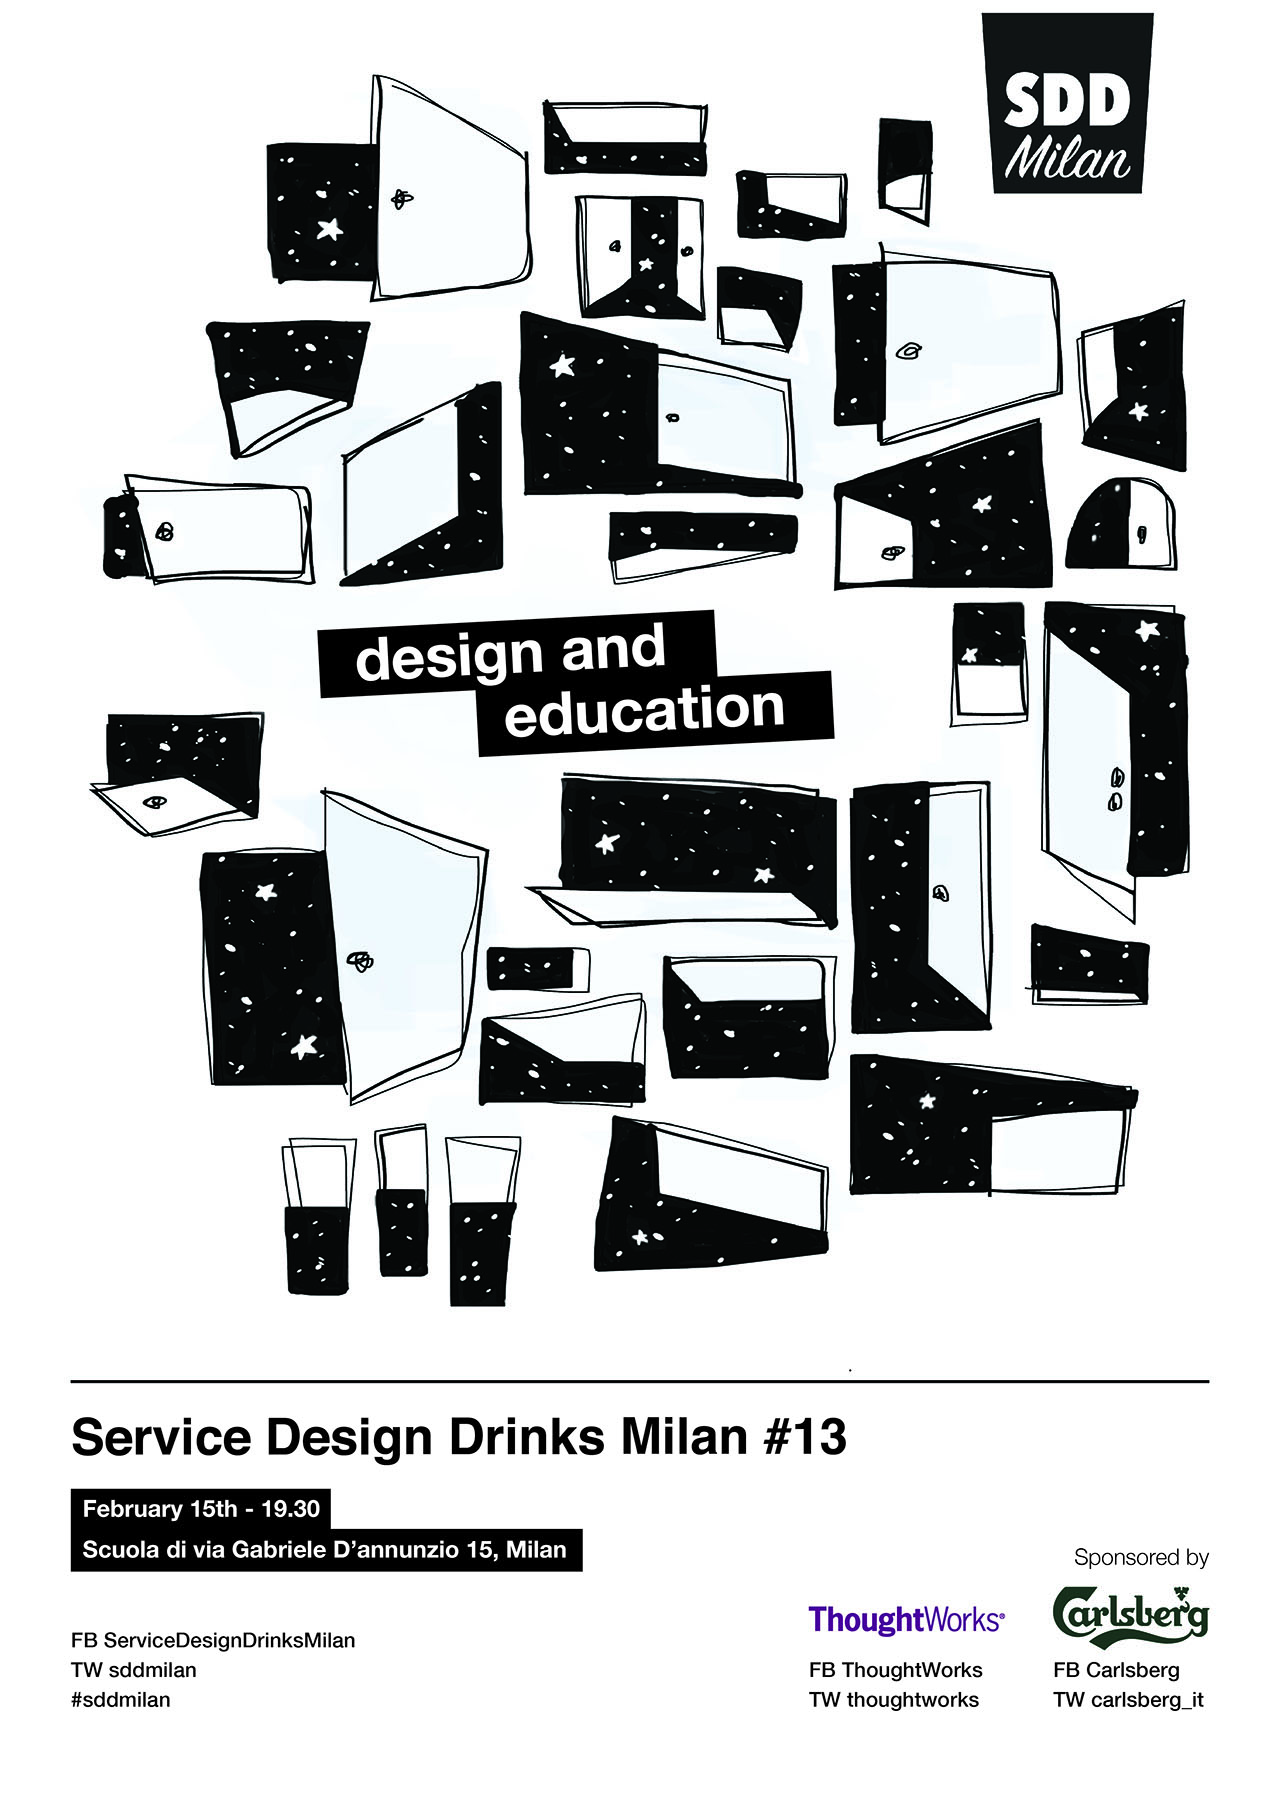 Service Design Drinks Milan #13 - Design and education.jpg